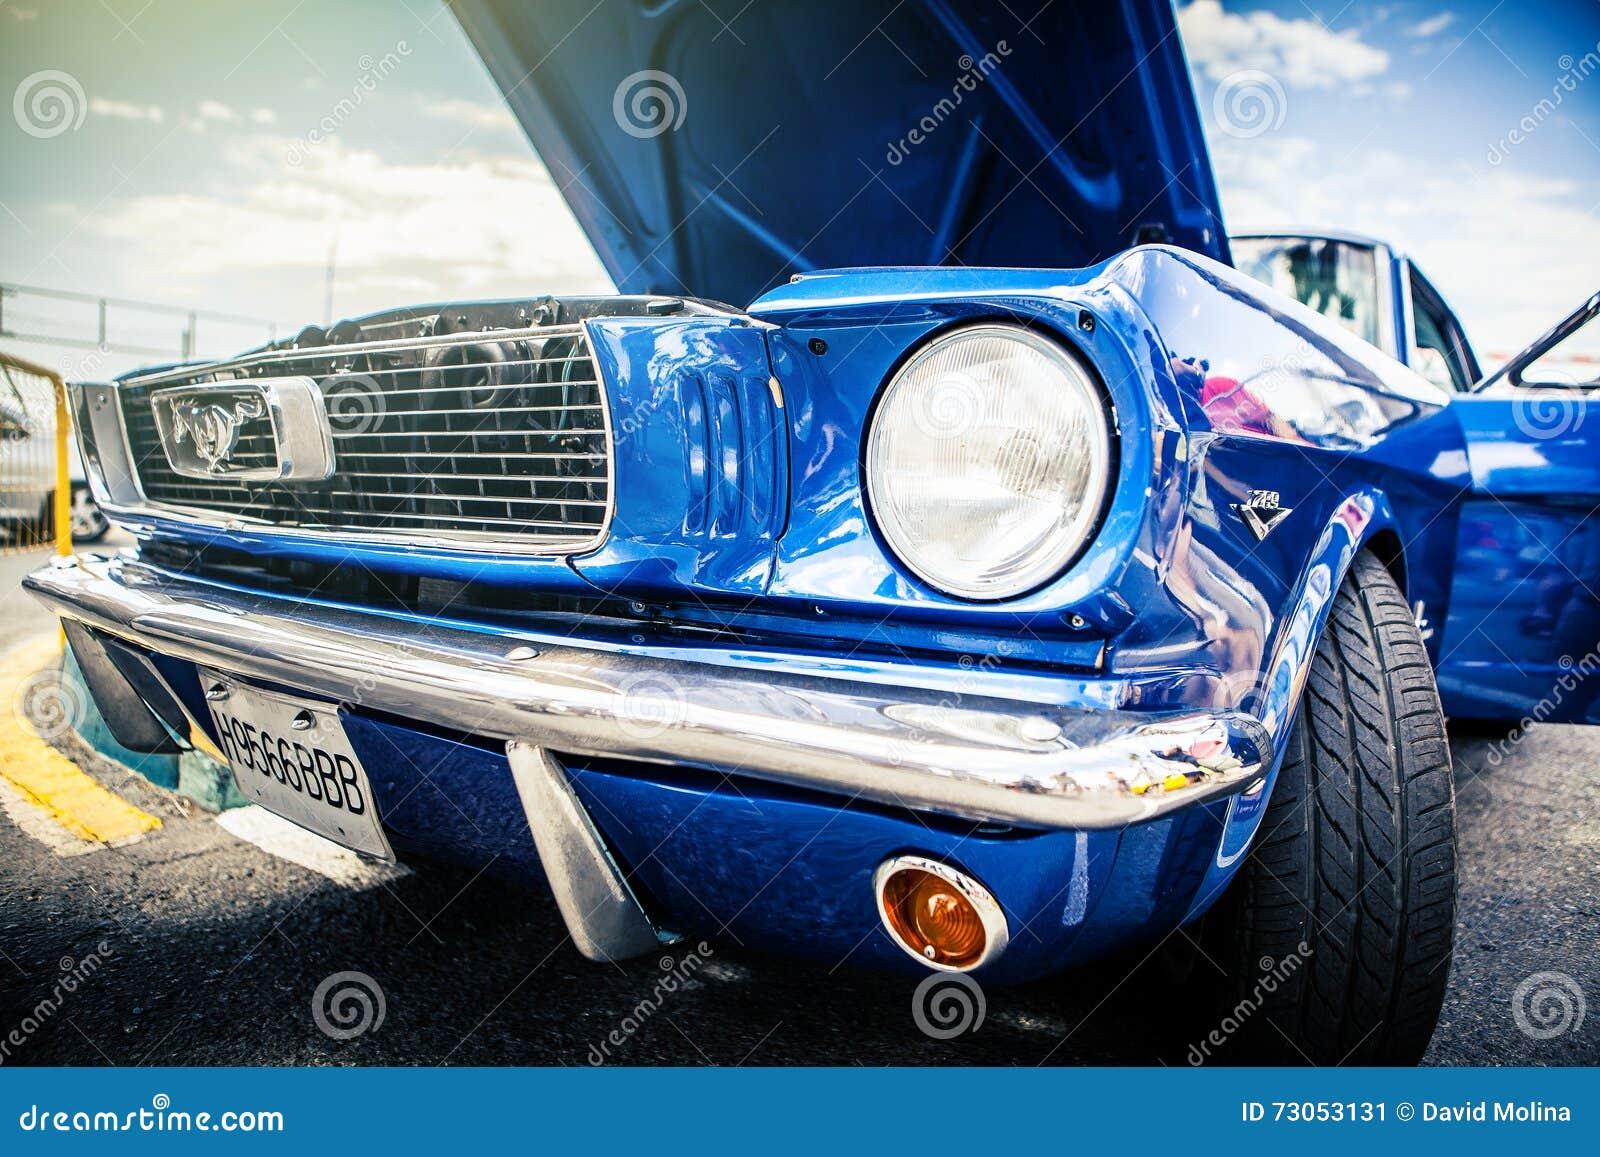 Benalmadena, España - 21 de junio de 2015: Vista delantera de Ford Mustang clásico en color azul